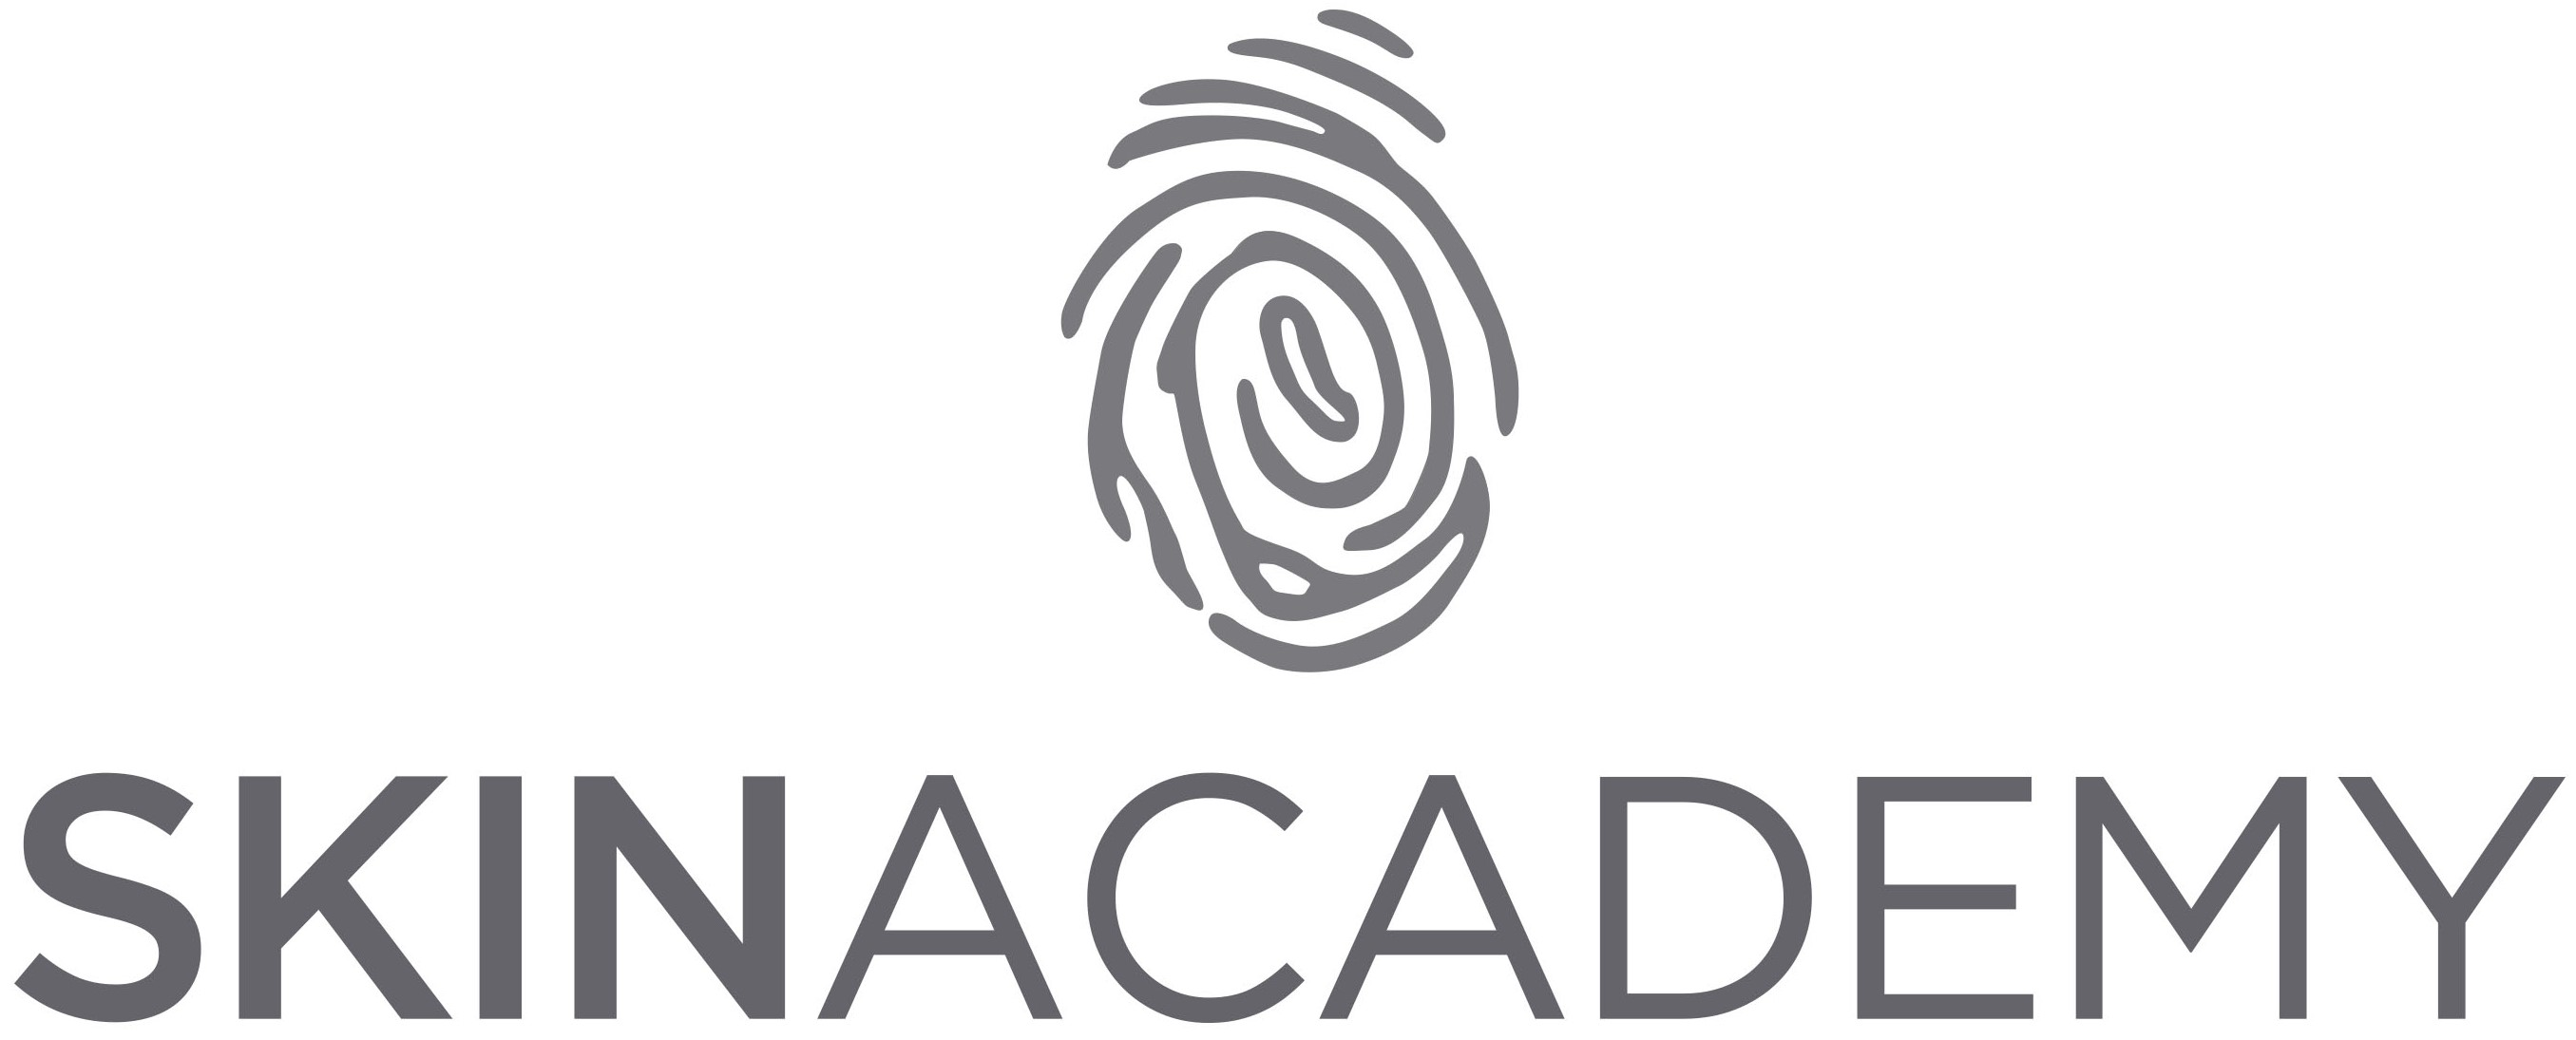 skin-academy-logo.jpg